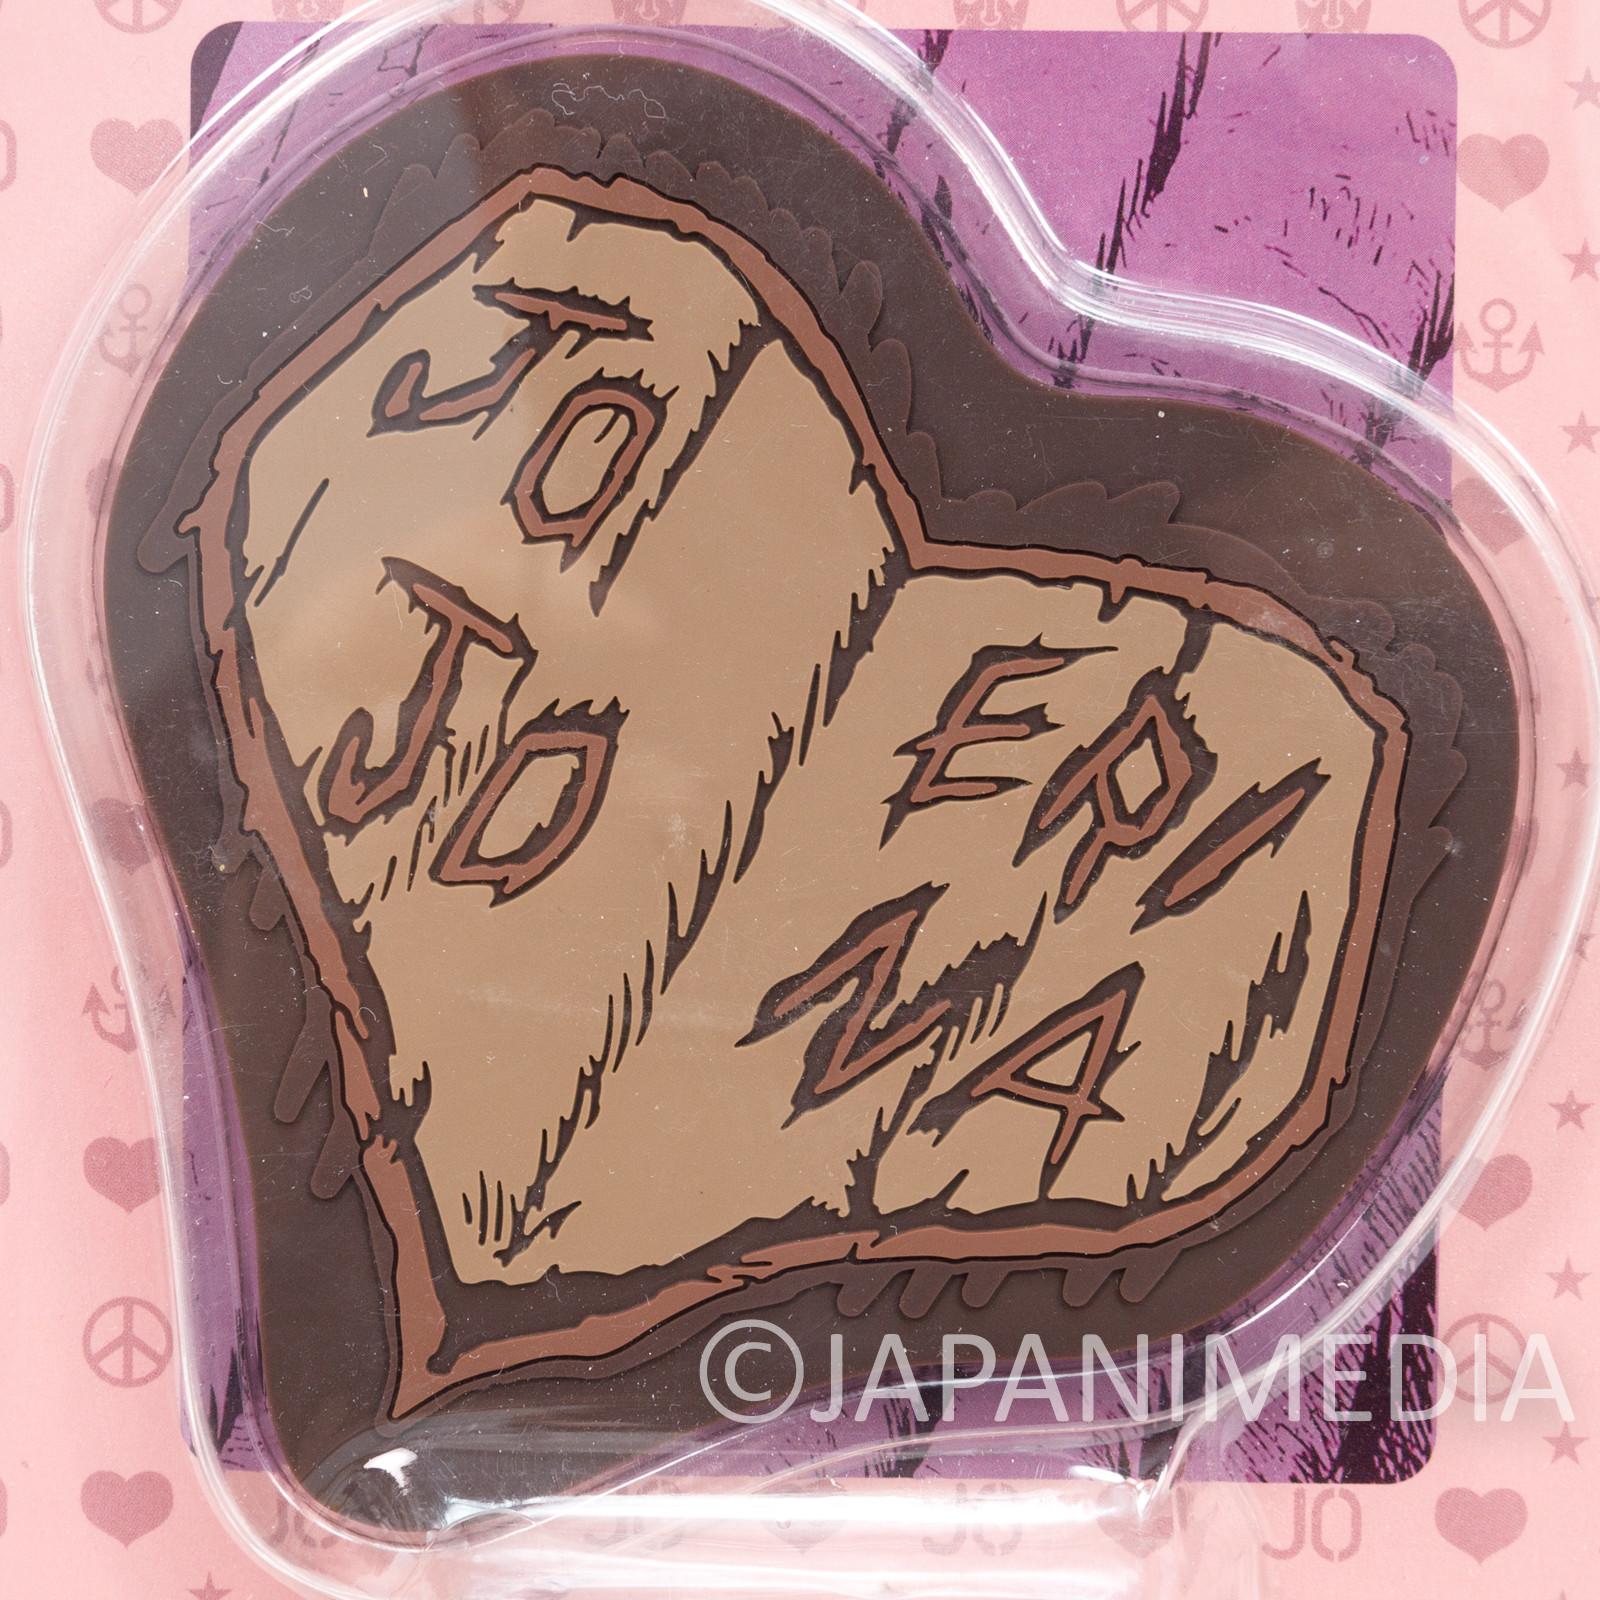 JoJo's Bizarre Adventure Rubber Coaster Jonathan and Erina's Sign of Love ANIME